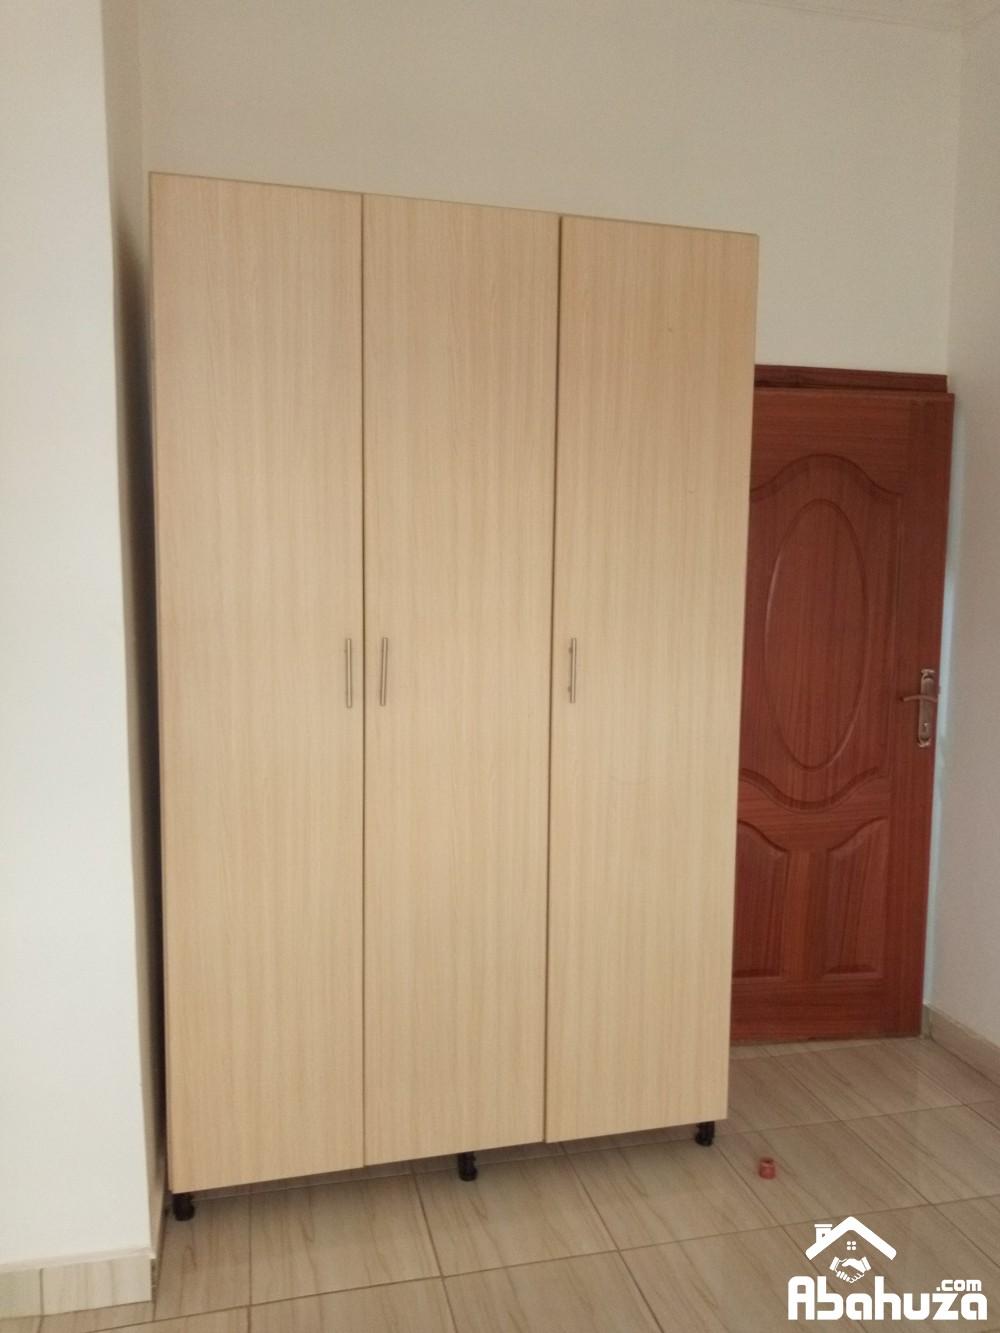 12. Wardrobe